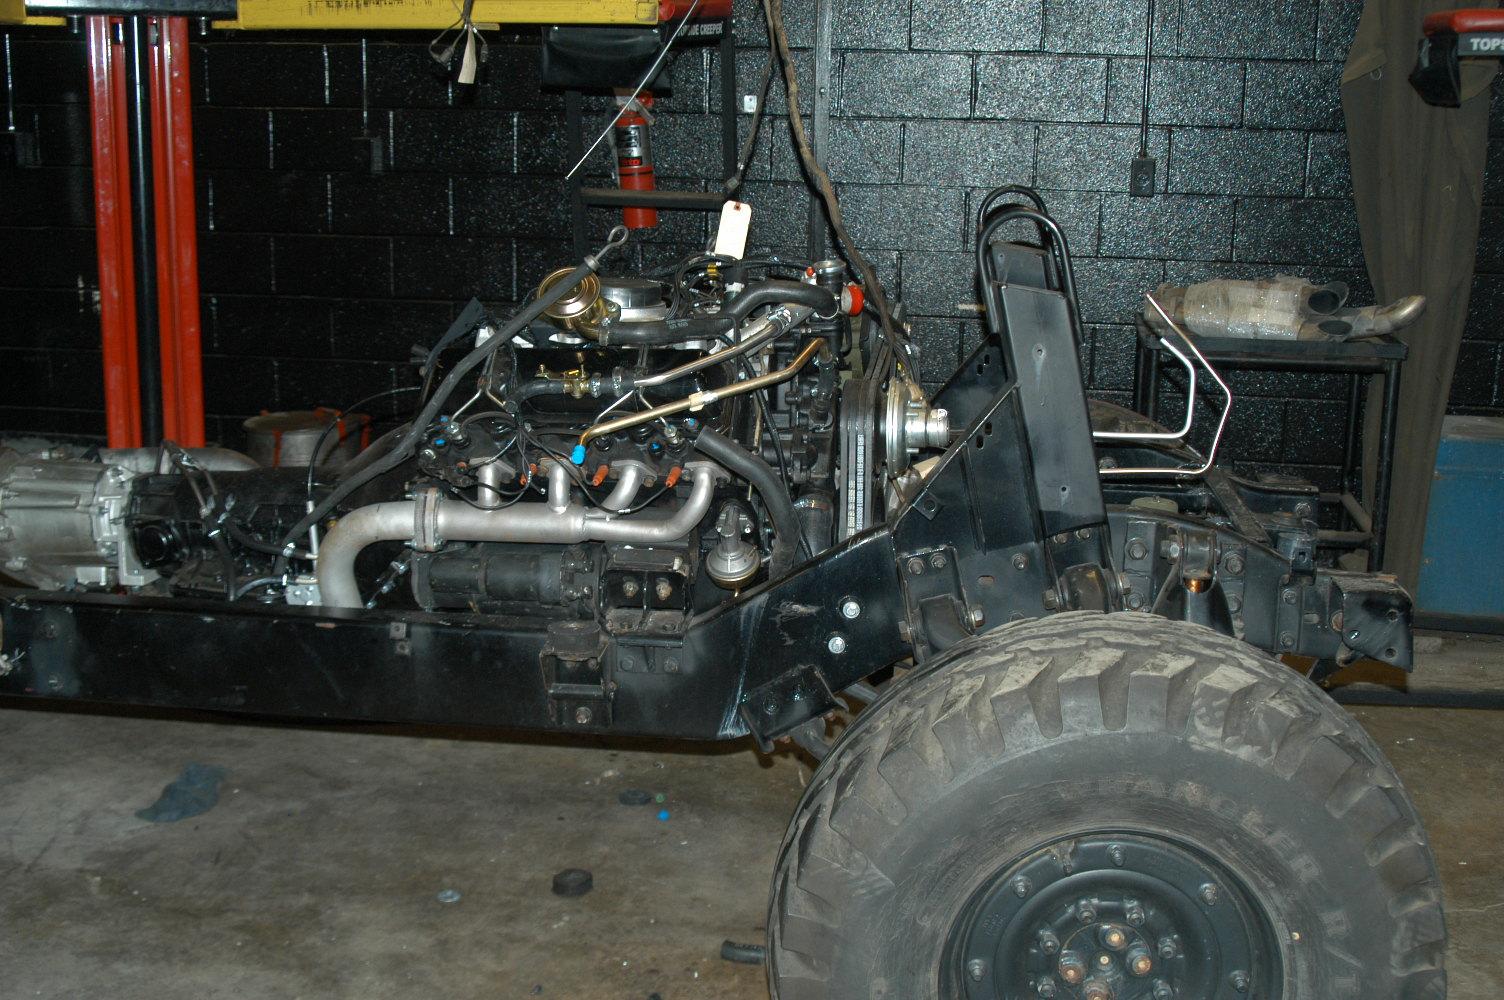 m998 hmmwv h1 hummer rebuild builds humvee vehicles sold custom